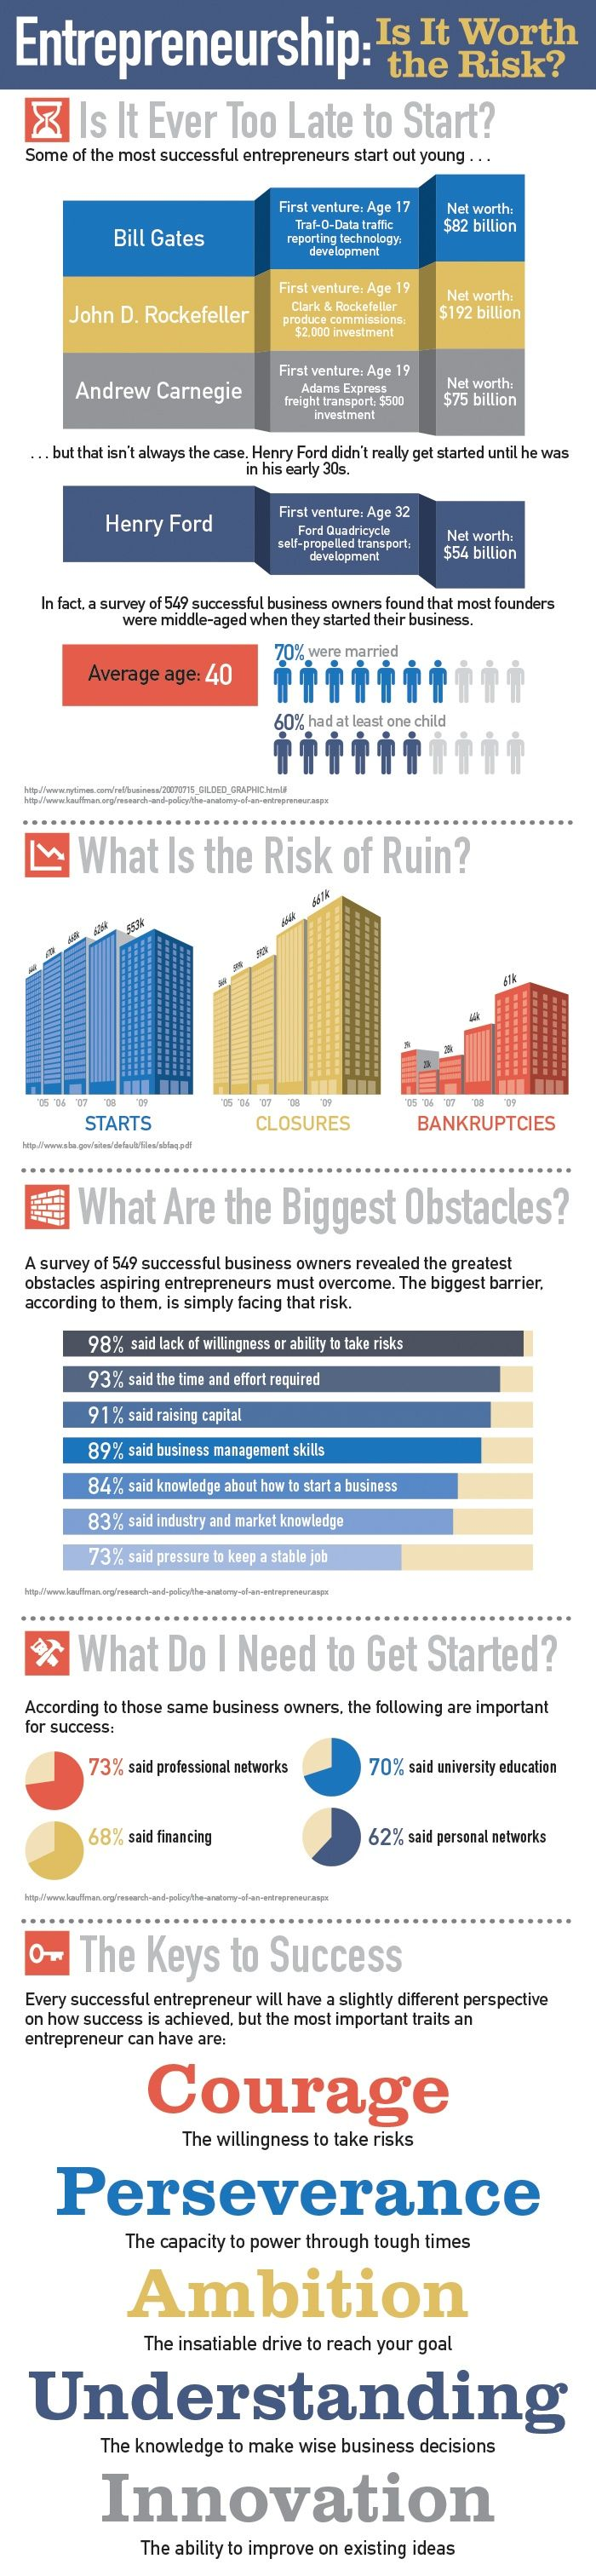 Characteristics-of-a-Successful-Entrepreneur